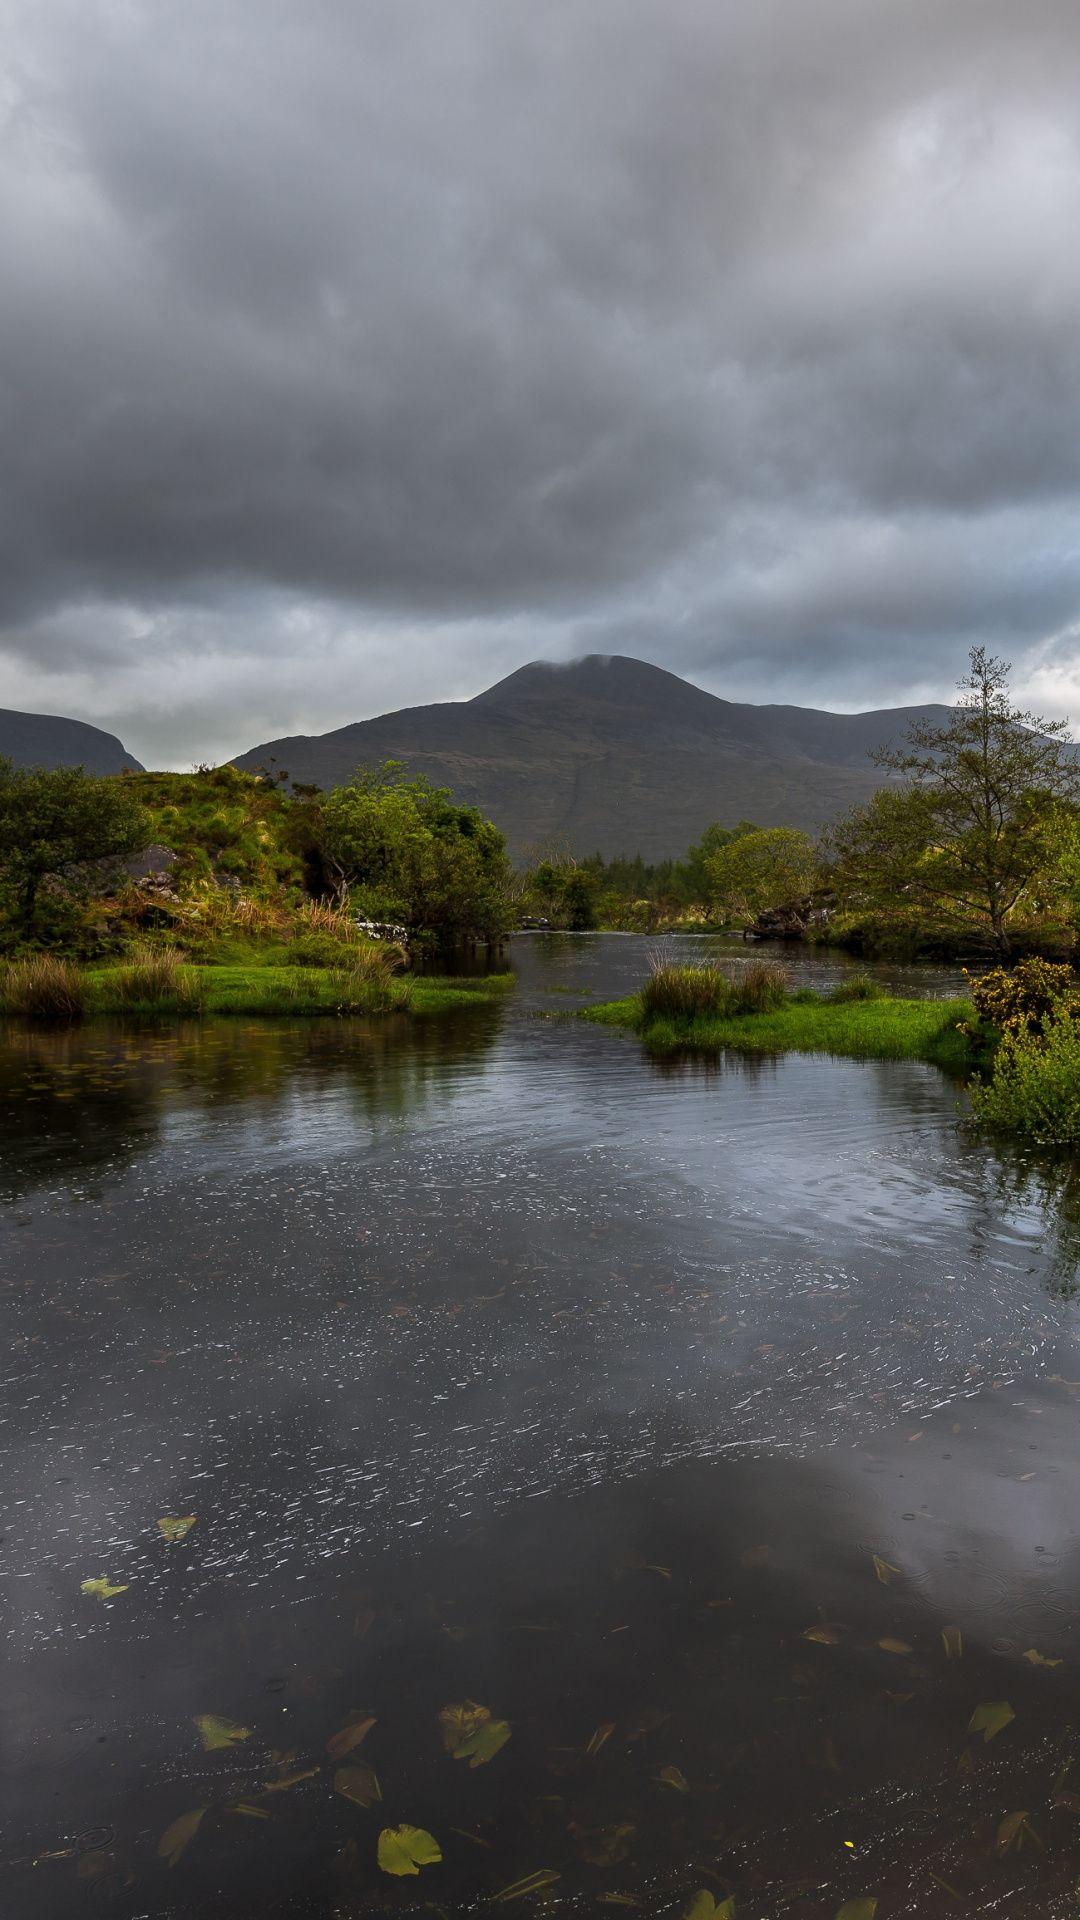 Ireland Apple iPhone wallpaper